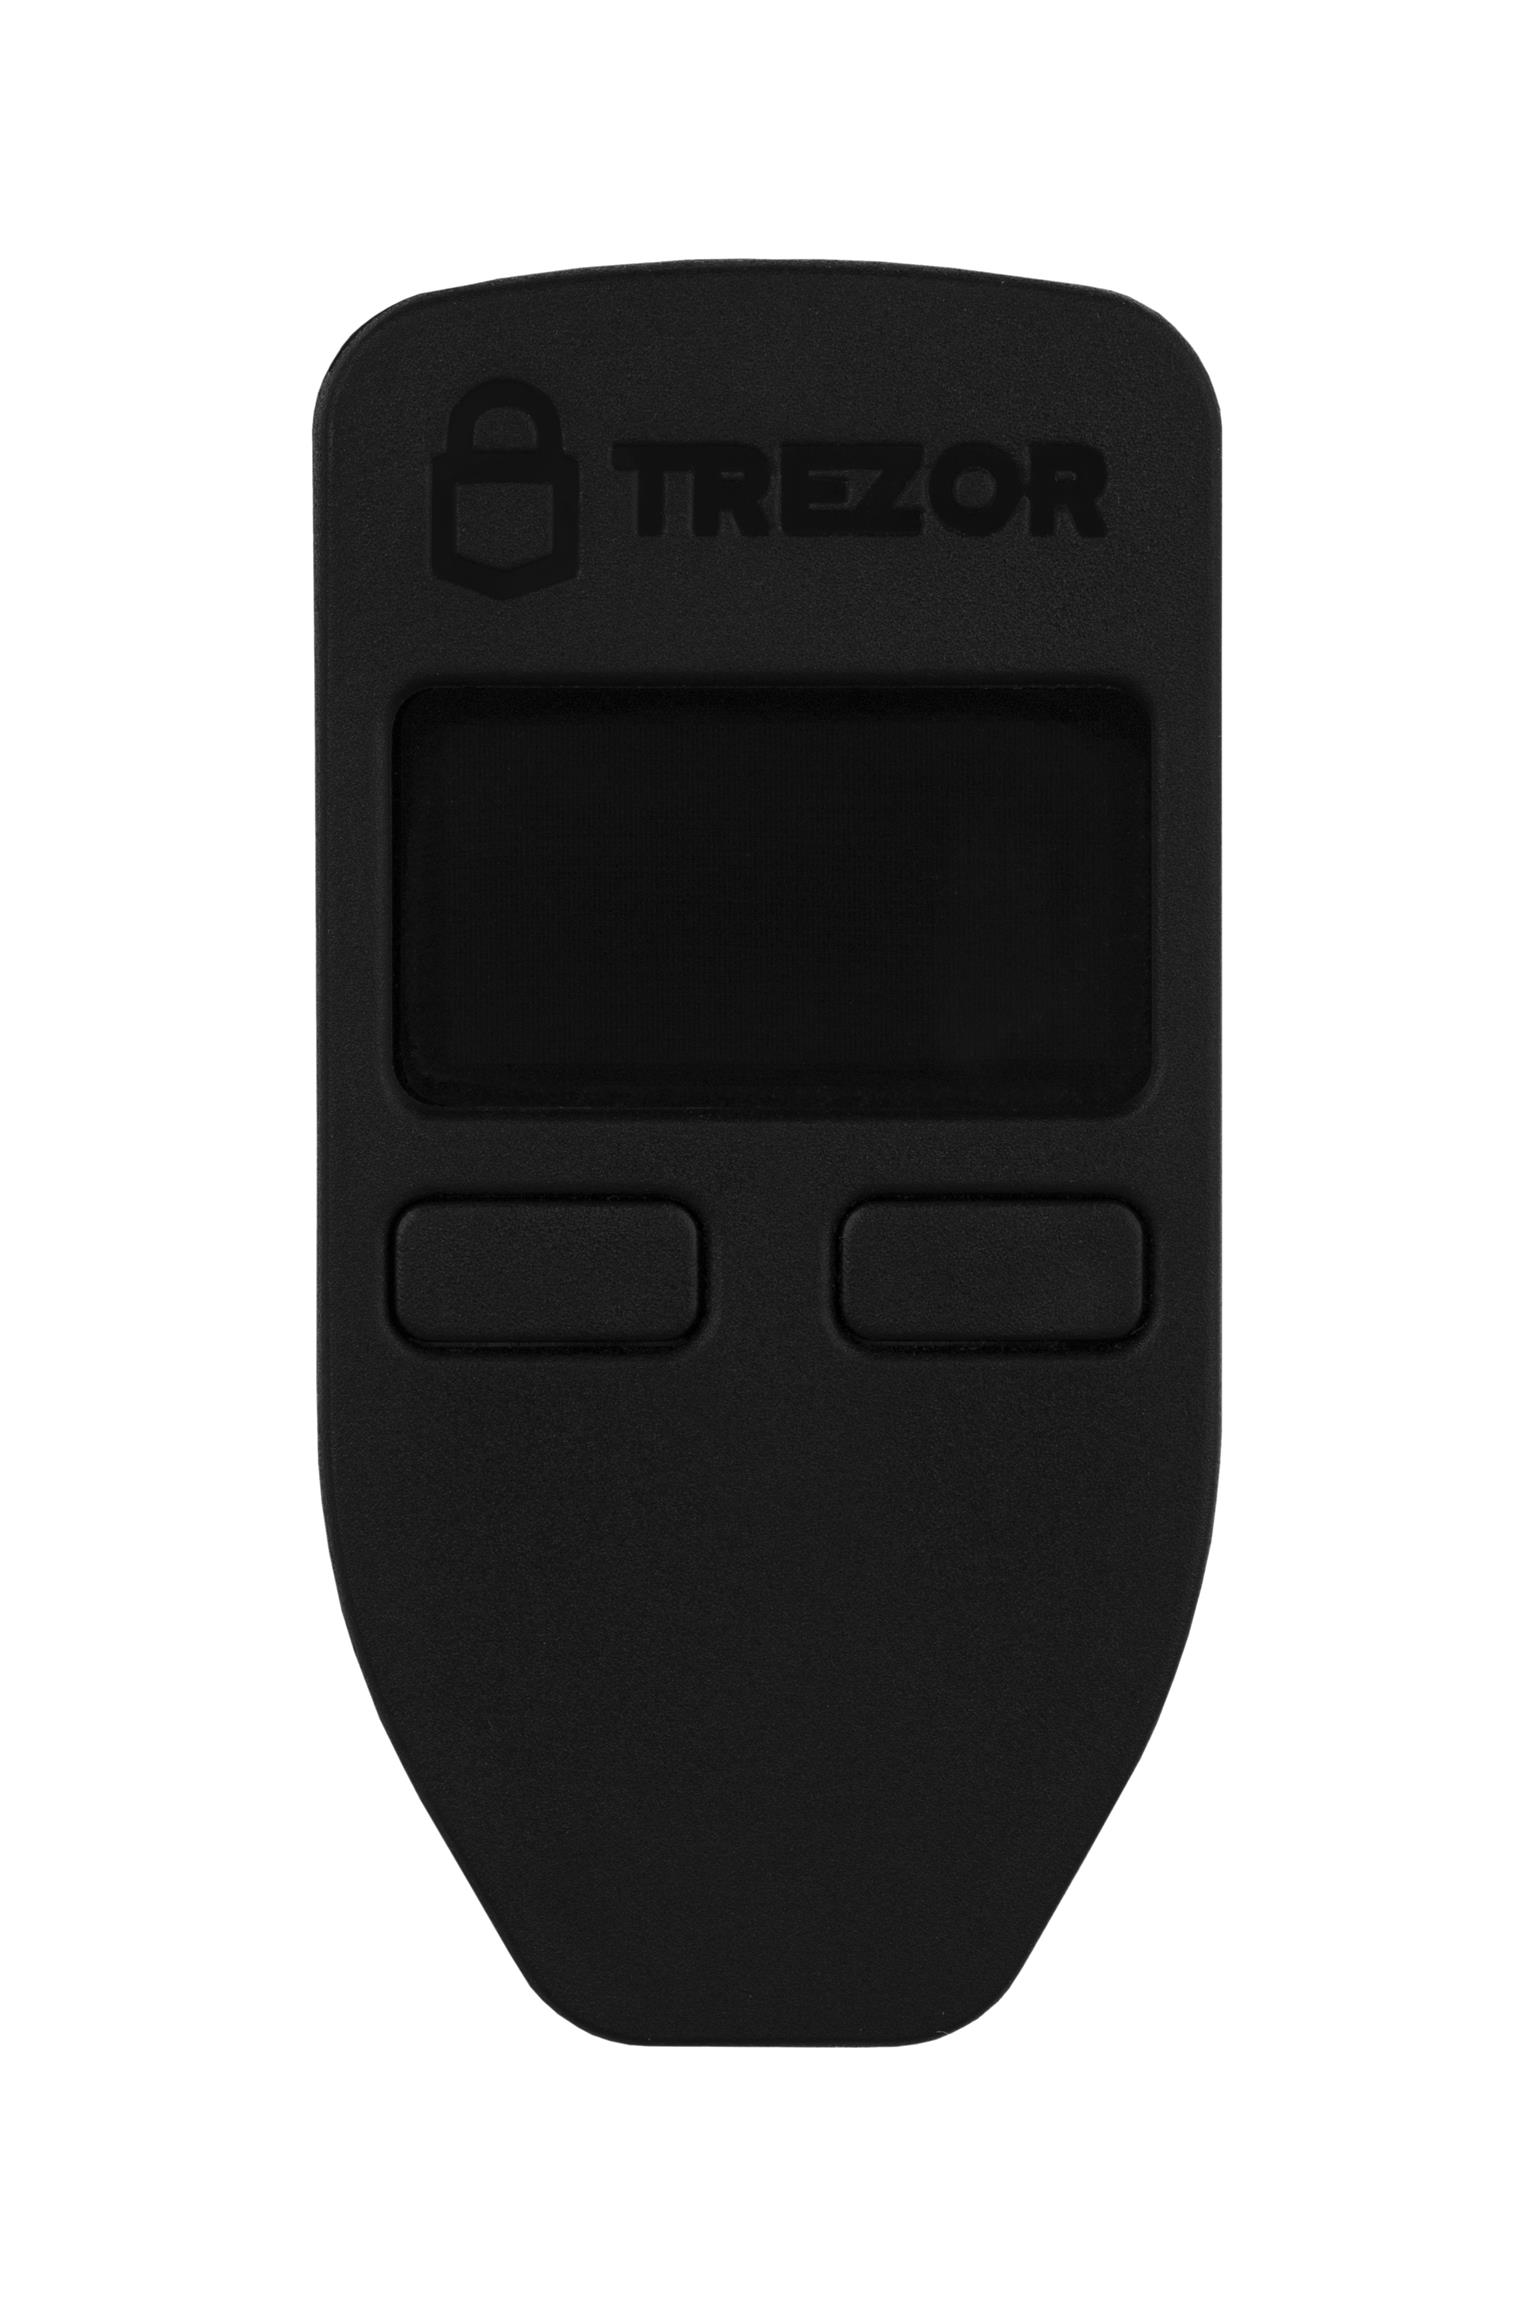 Trezor - Bitcoin Hardware Wallet